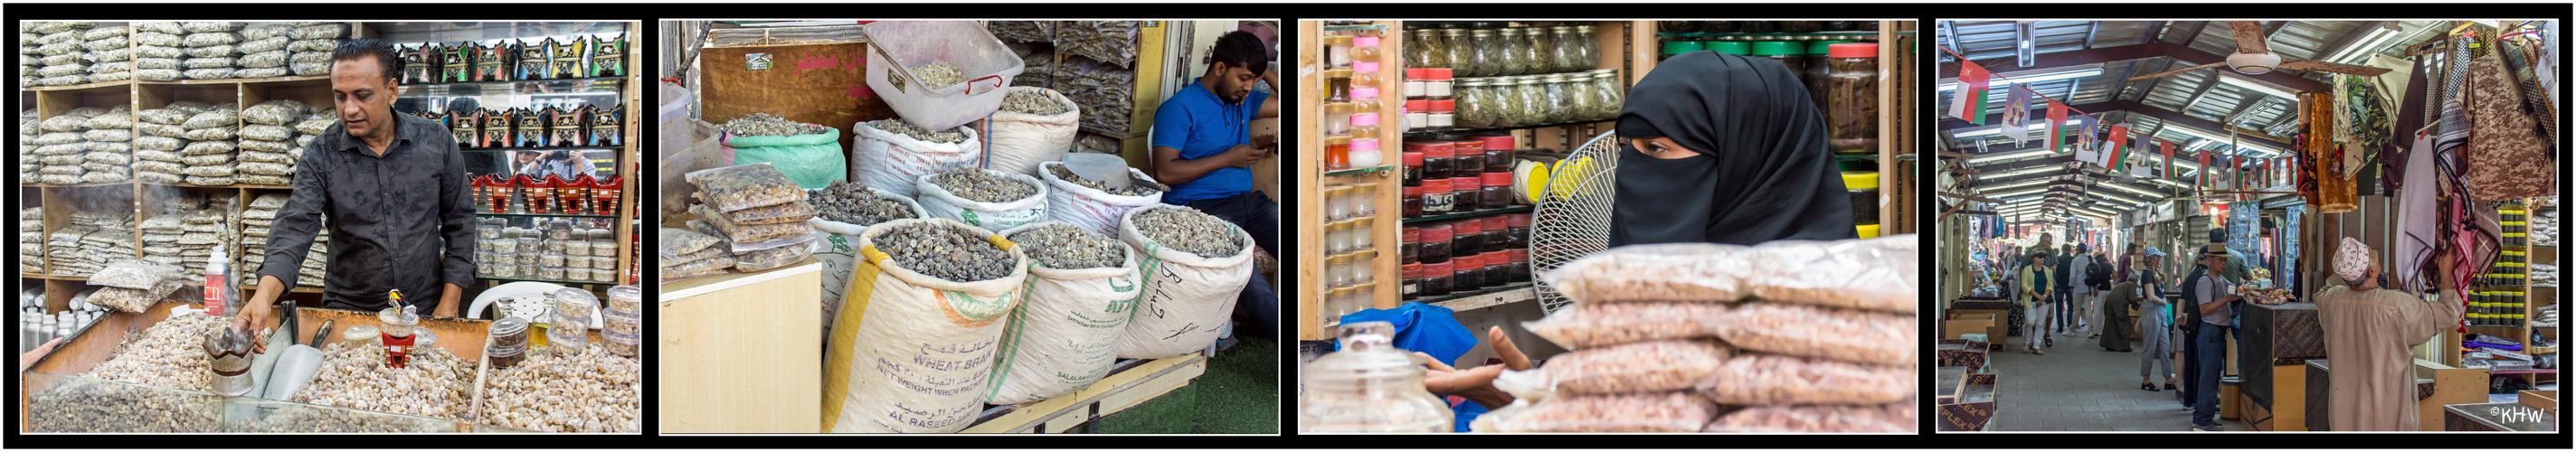 Weihrauchmarkt Salalah (Oman) 2